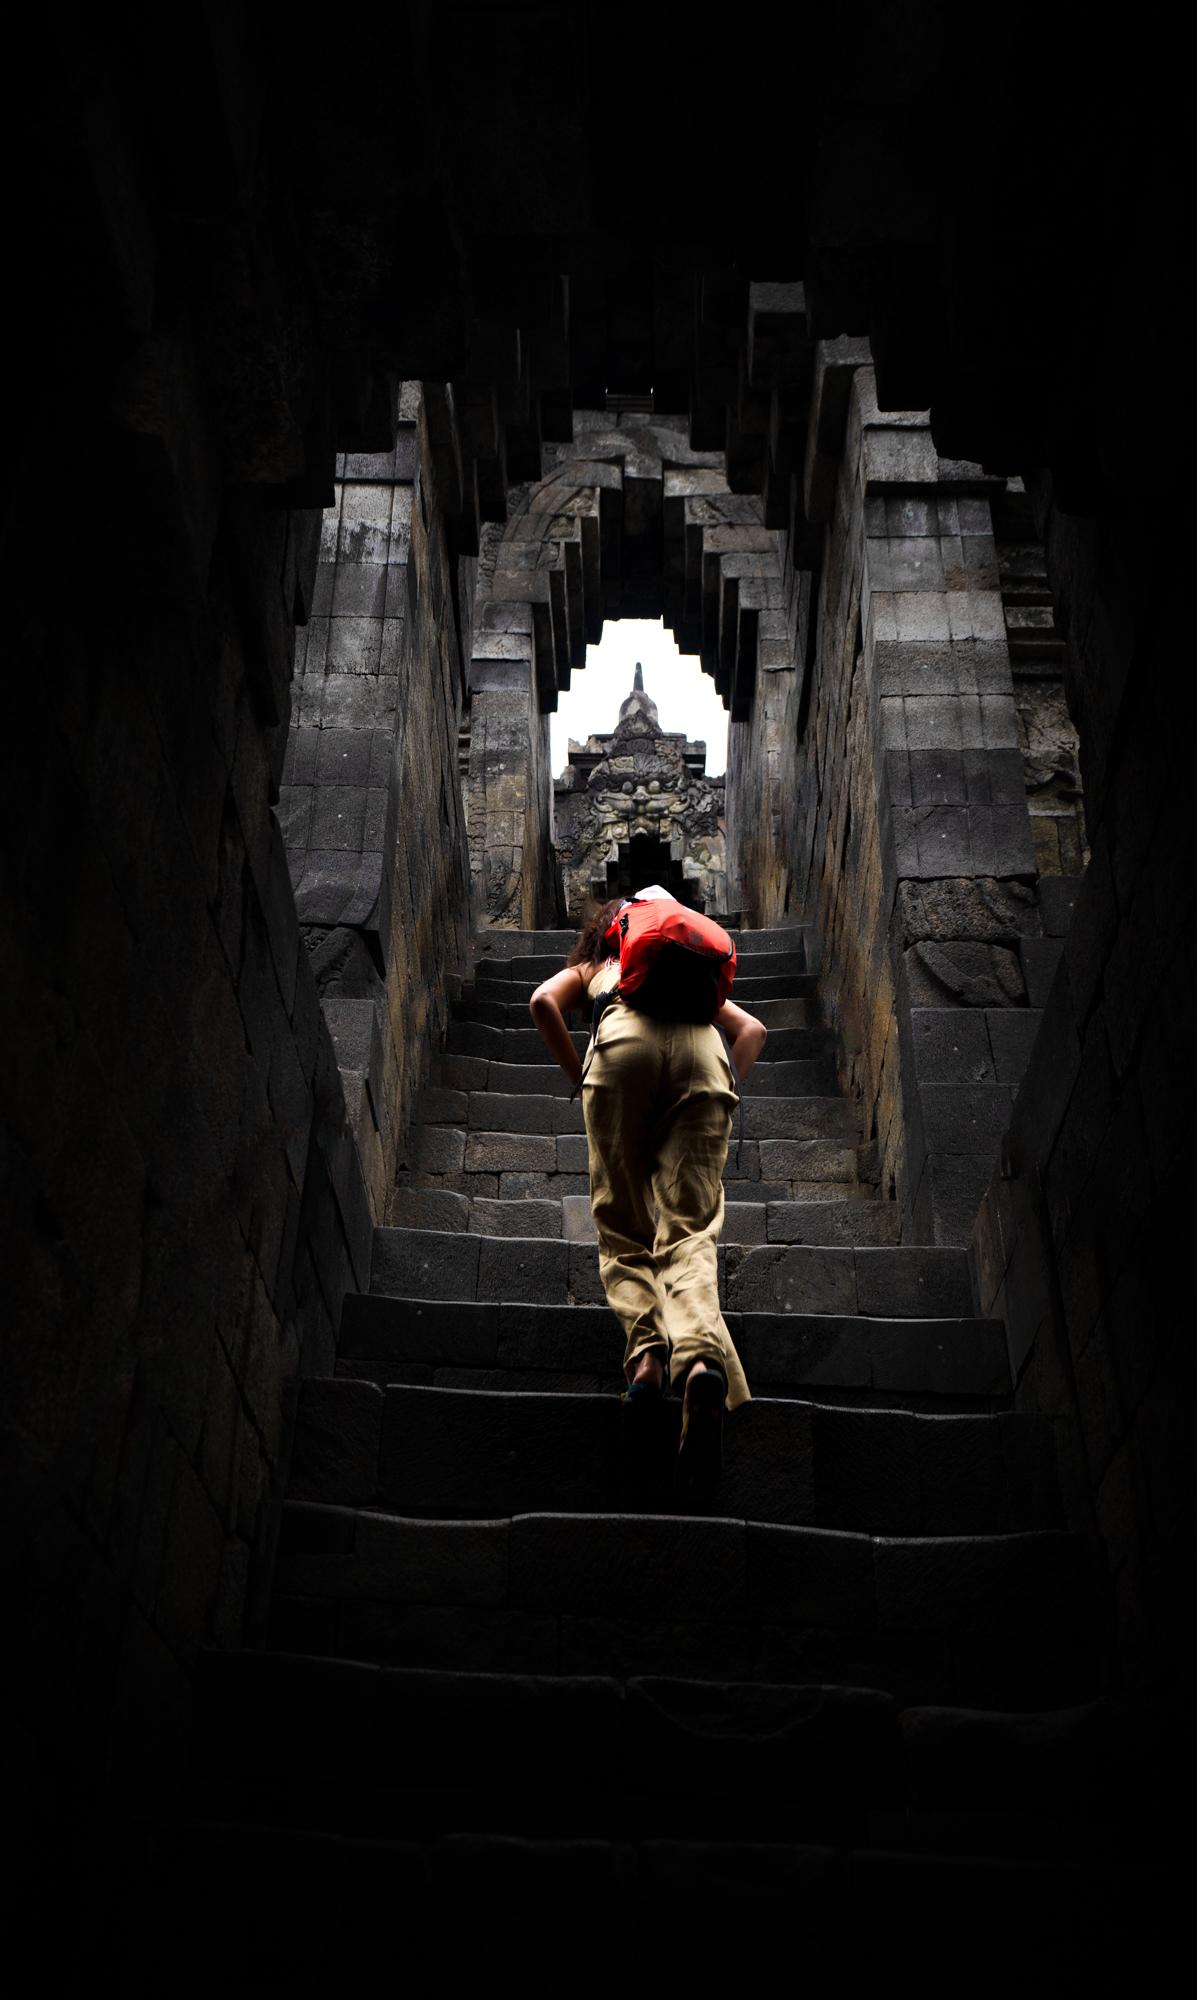 Indonesia Borobudur Temple 32mm F4.5 1-250 sec ISO 320 Gregg Jaden.jpg